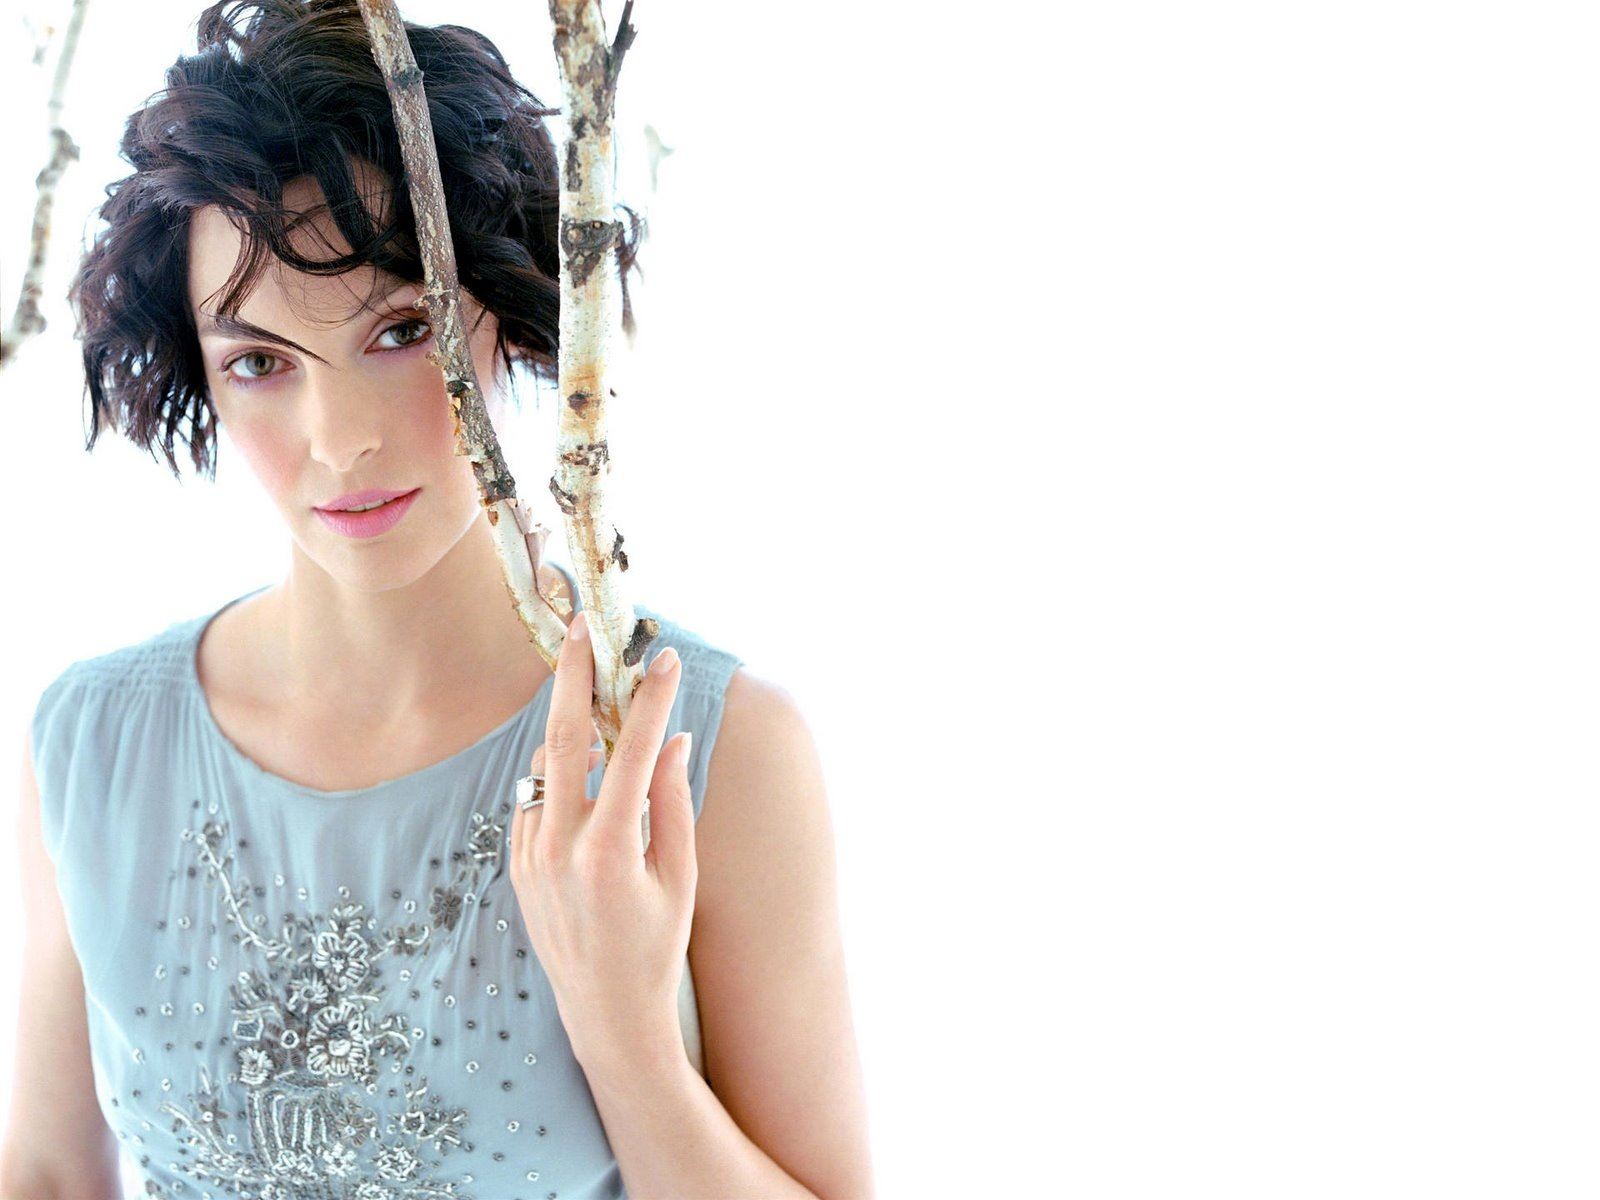 [Ashley Judd 3 1600x1200 hqmodelwallpapers[2].jpg]